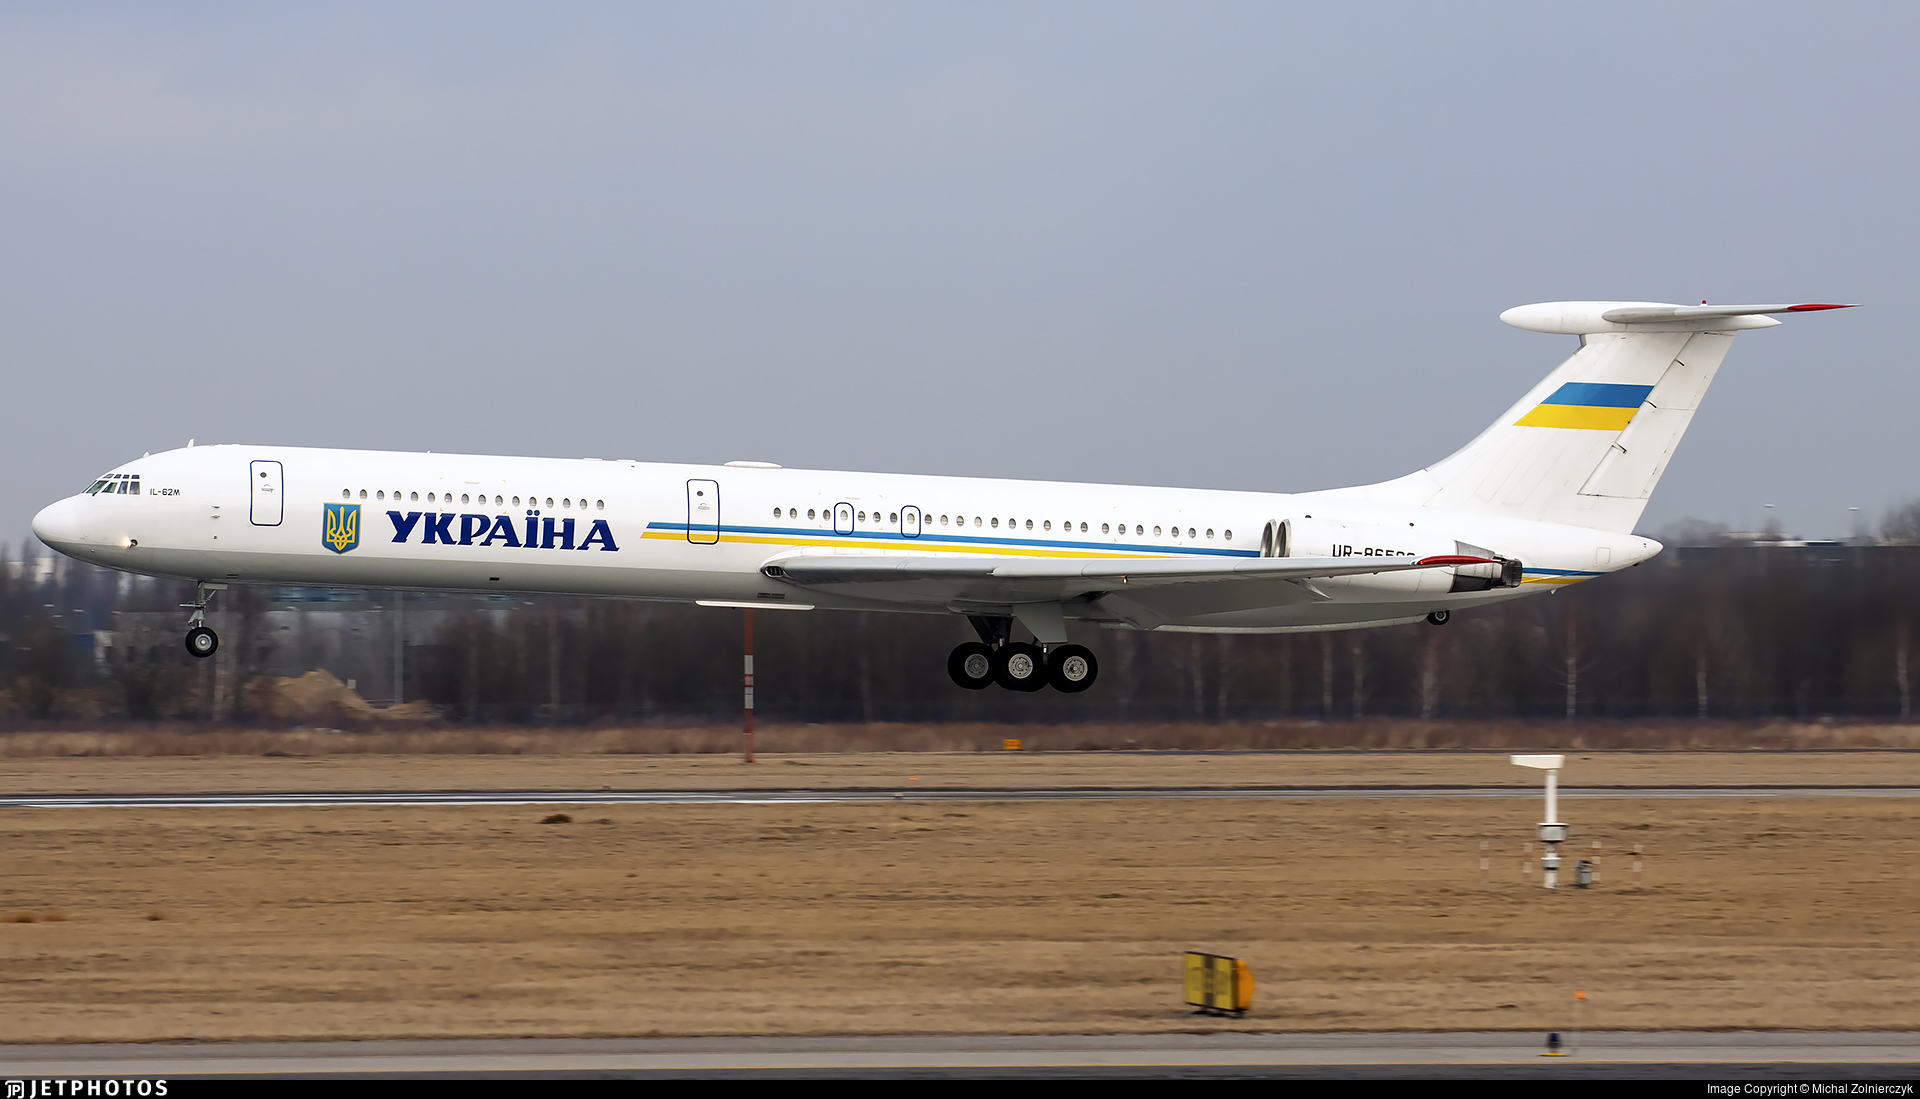 UR-86528 - Ilyushin IL-62M - Ukraine - Government